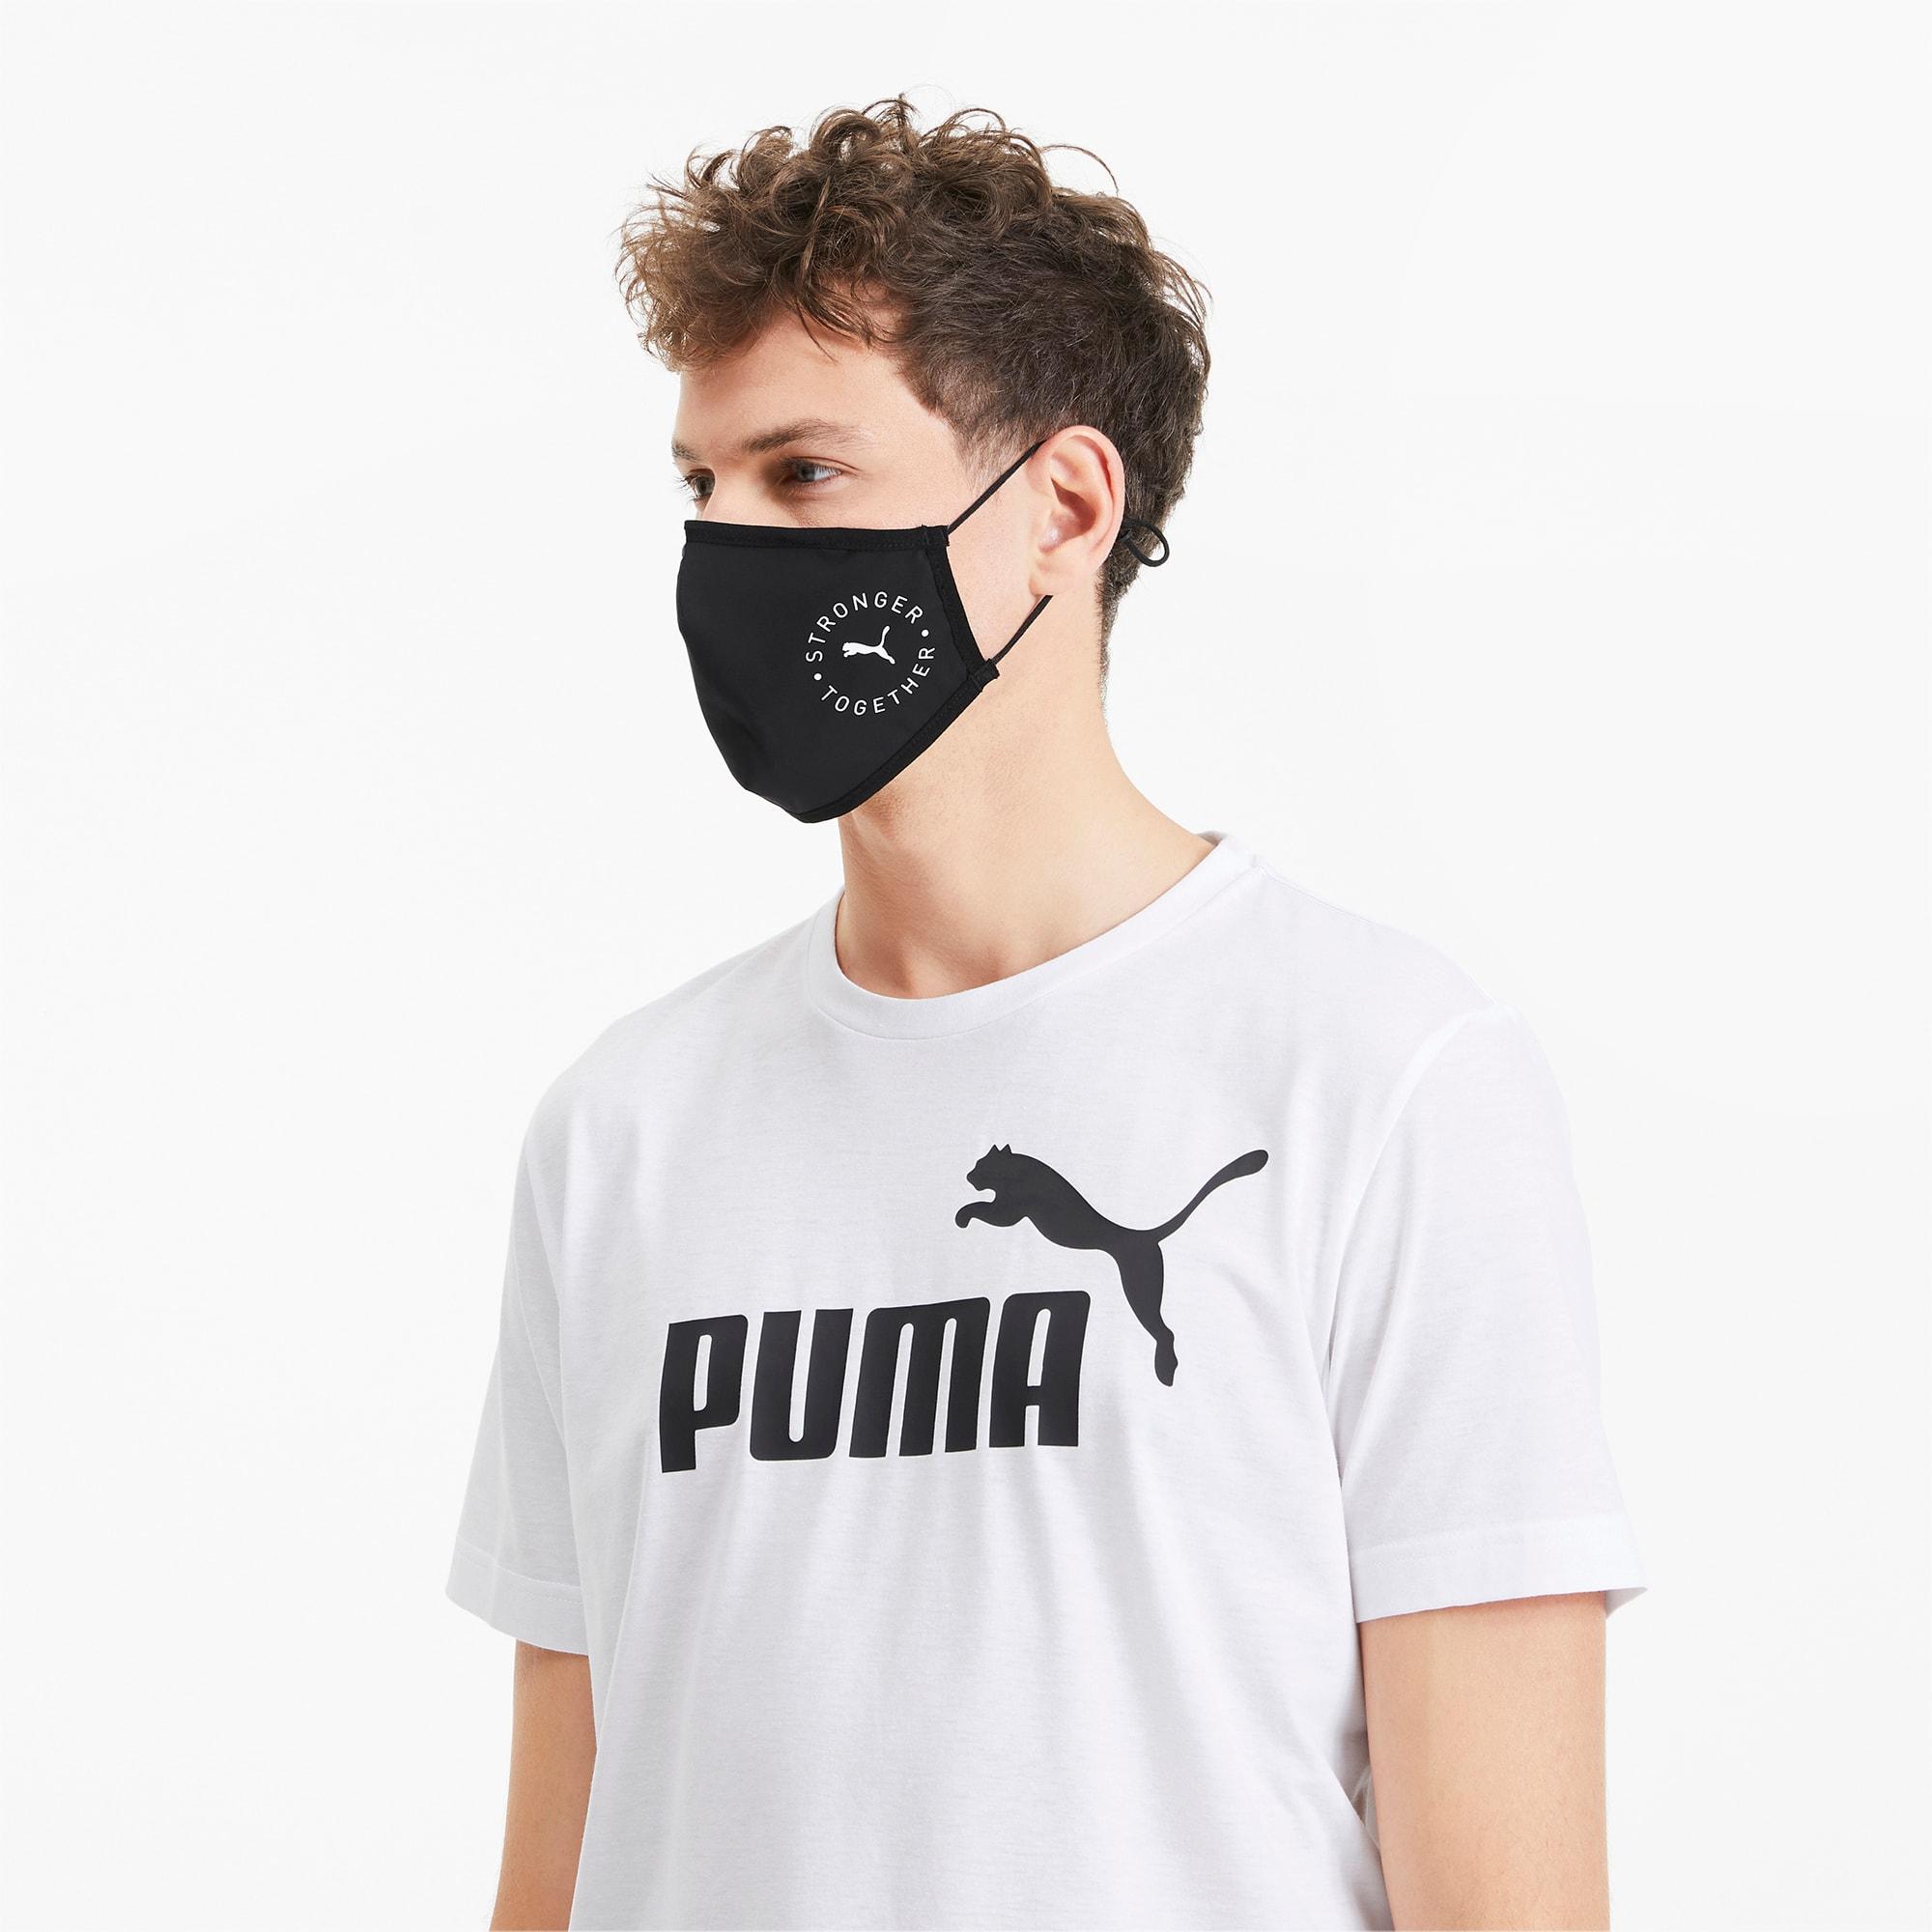 PUMA Face Mask (Set of 2)